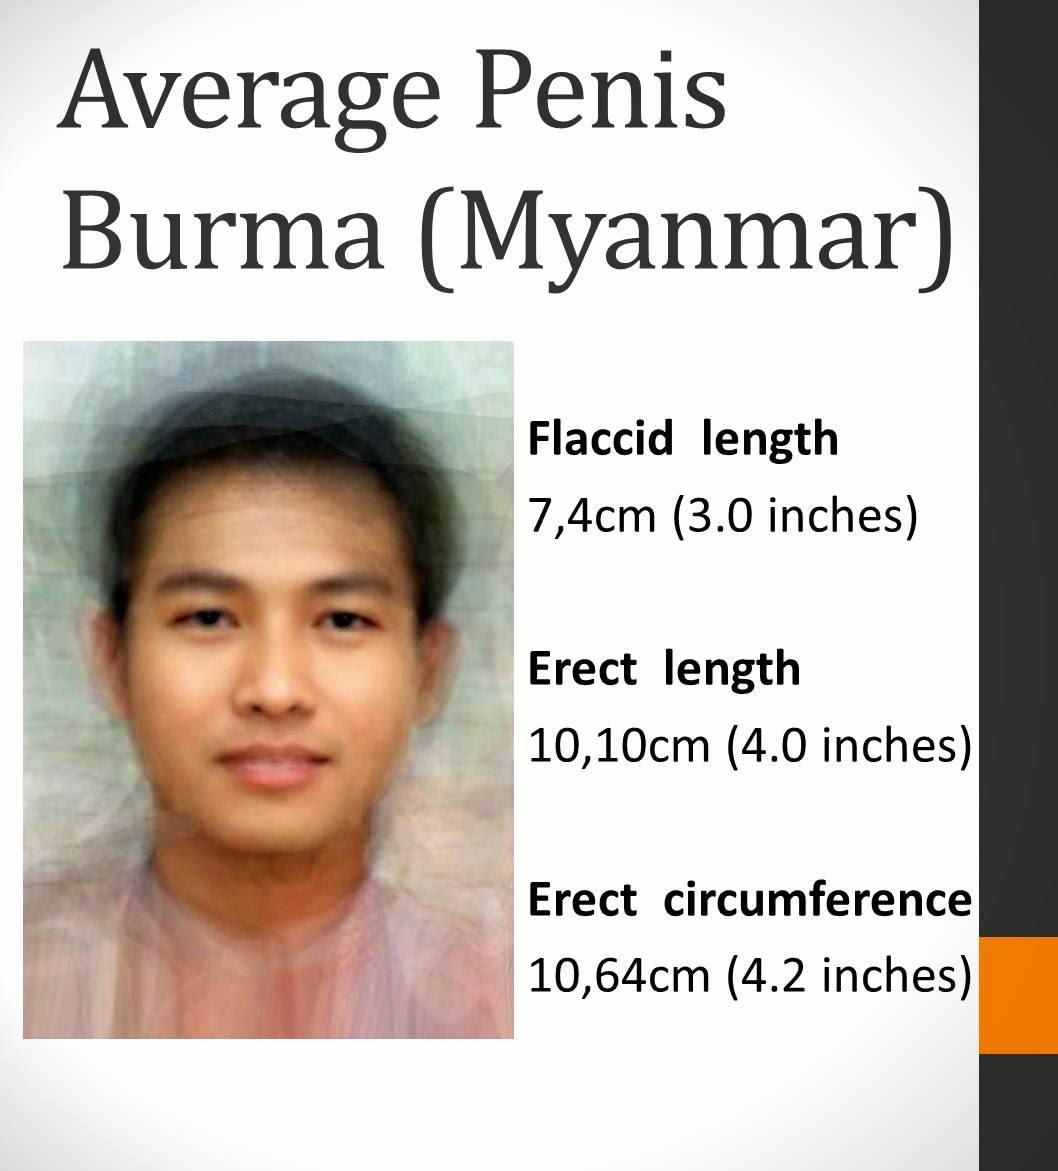 Average Penis Pictures 98